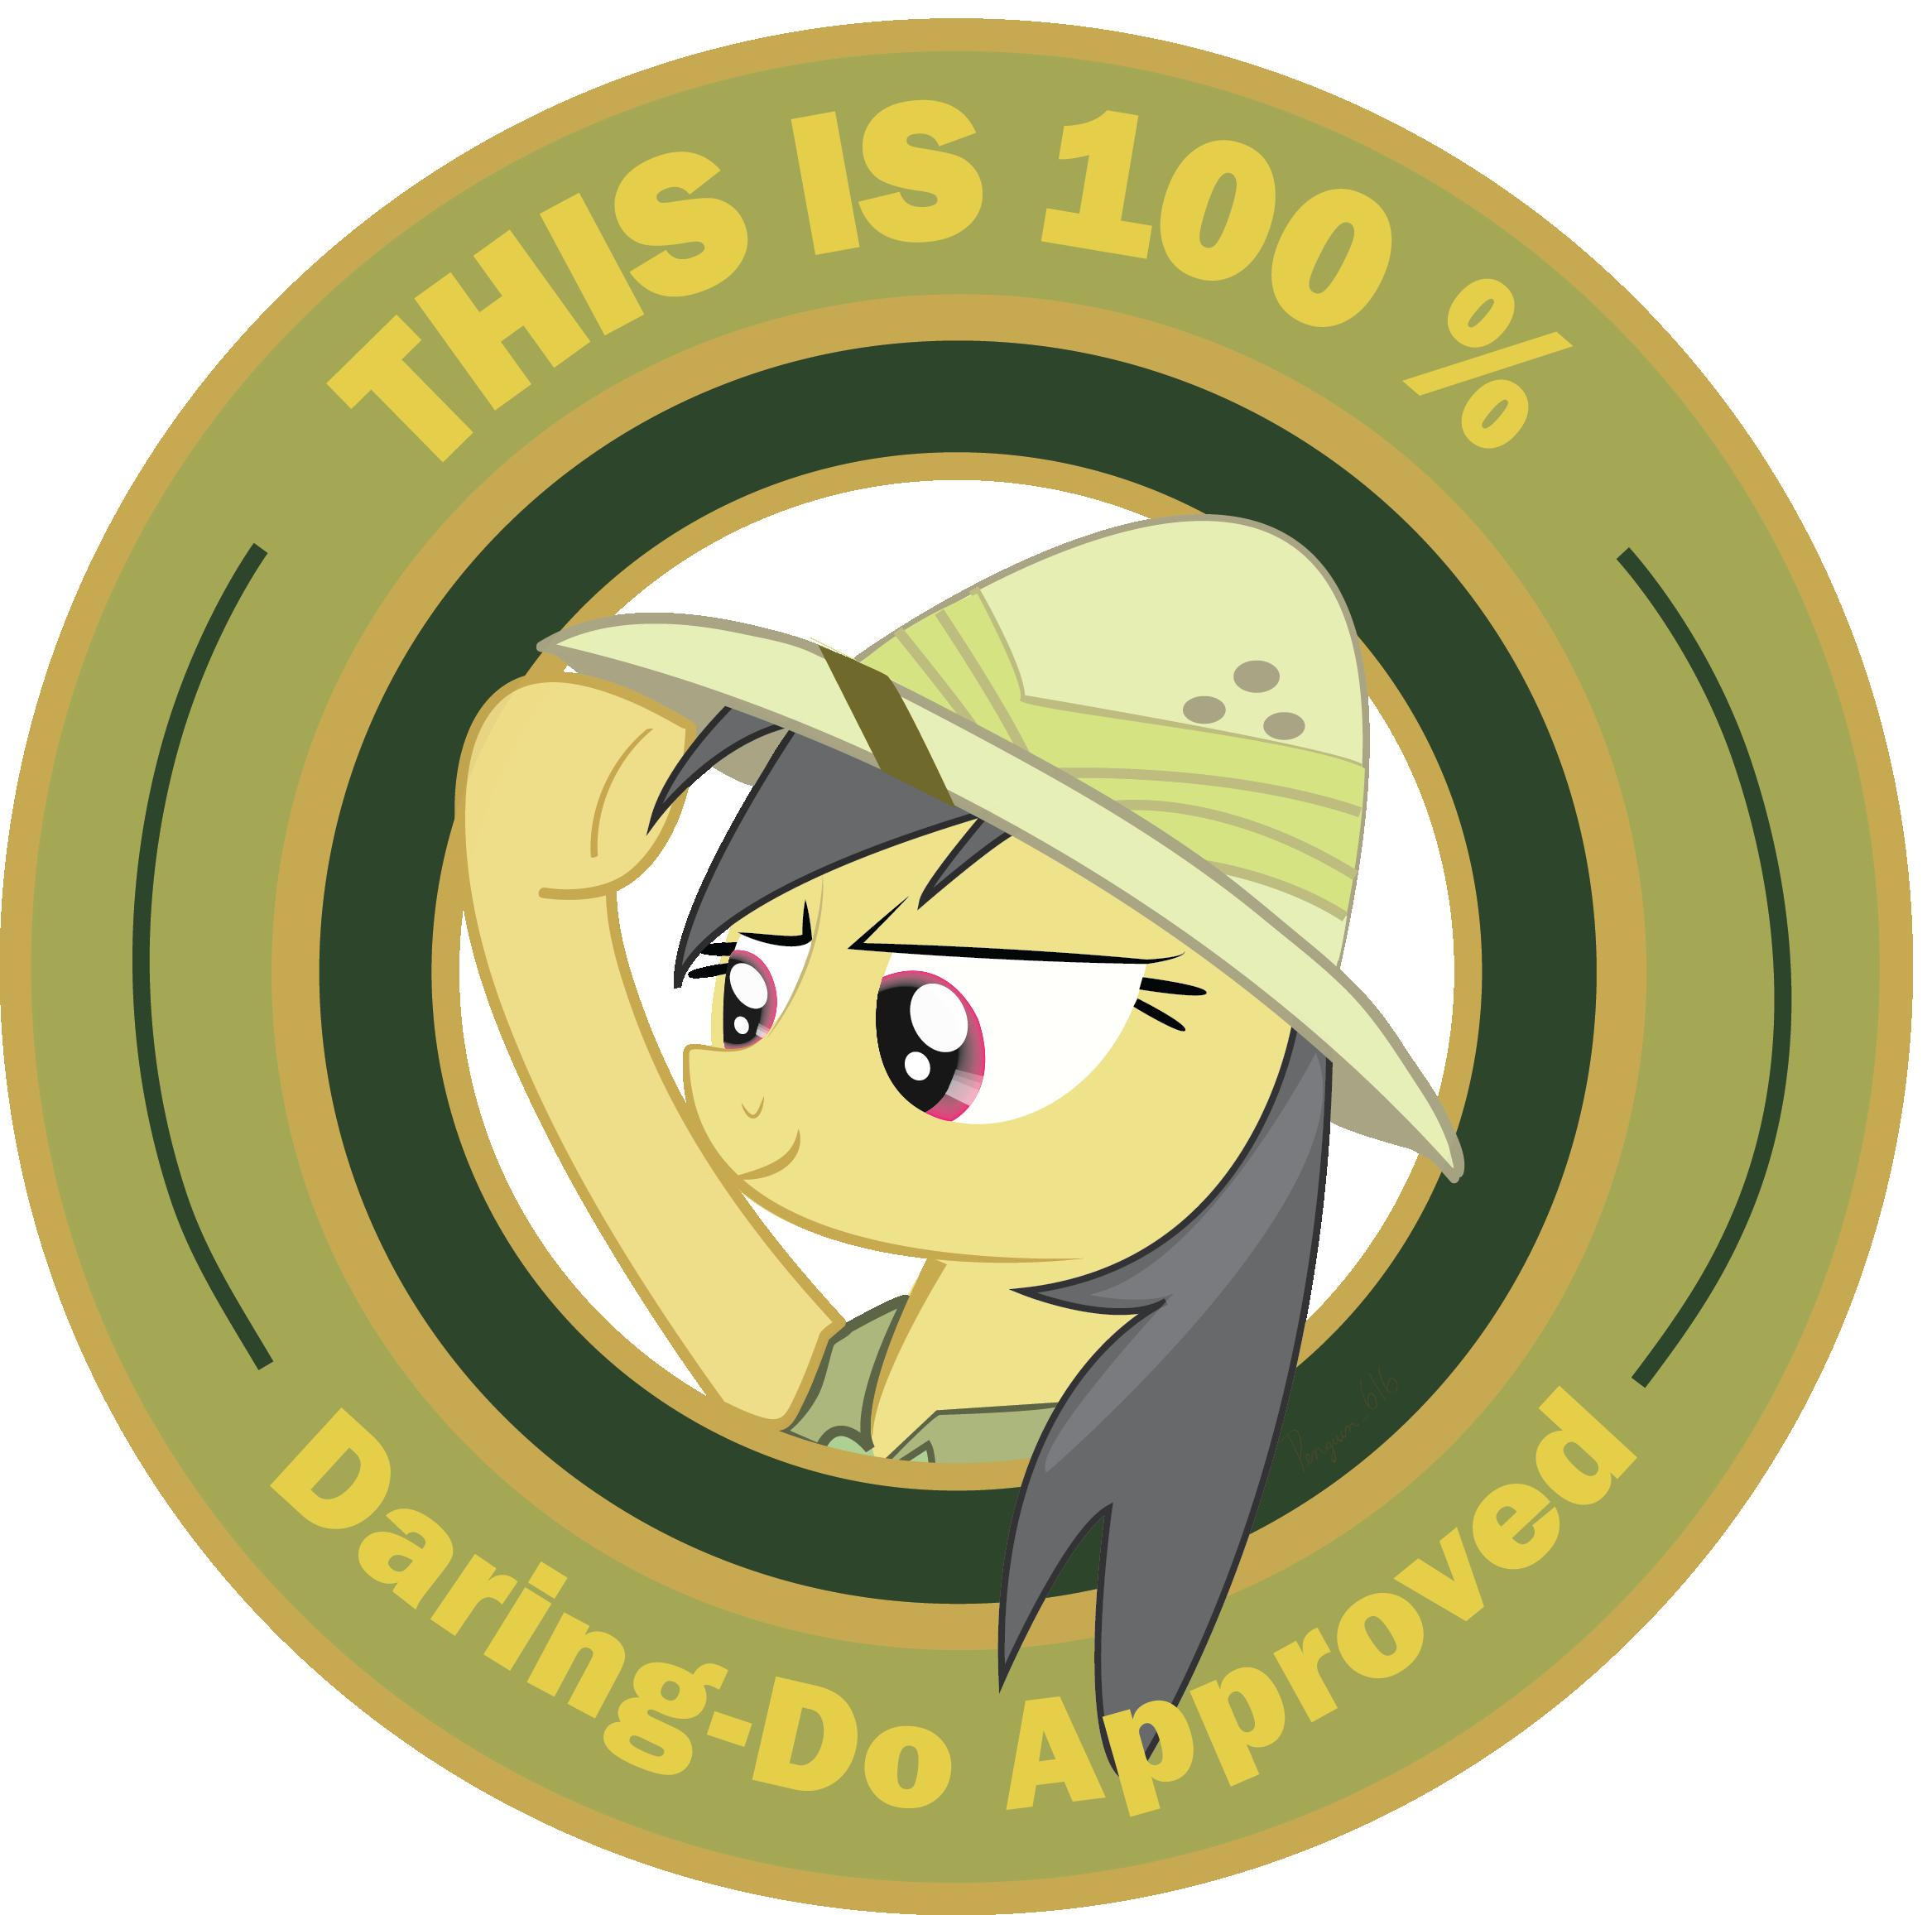 S 100 Aring Do O Appro Rarity Derpy Hooves Rainbow Dash Applejack Green Yellow Cartoon